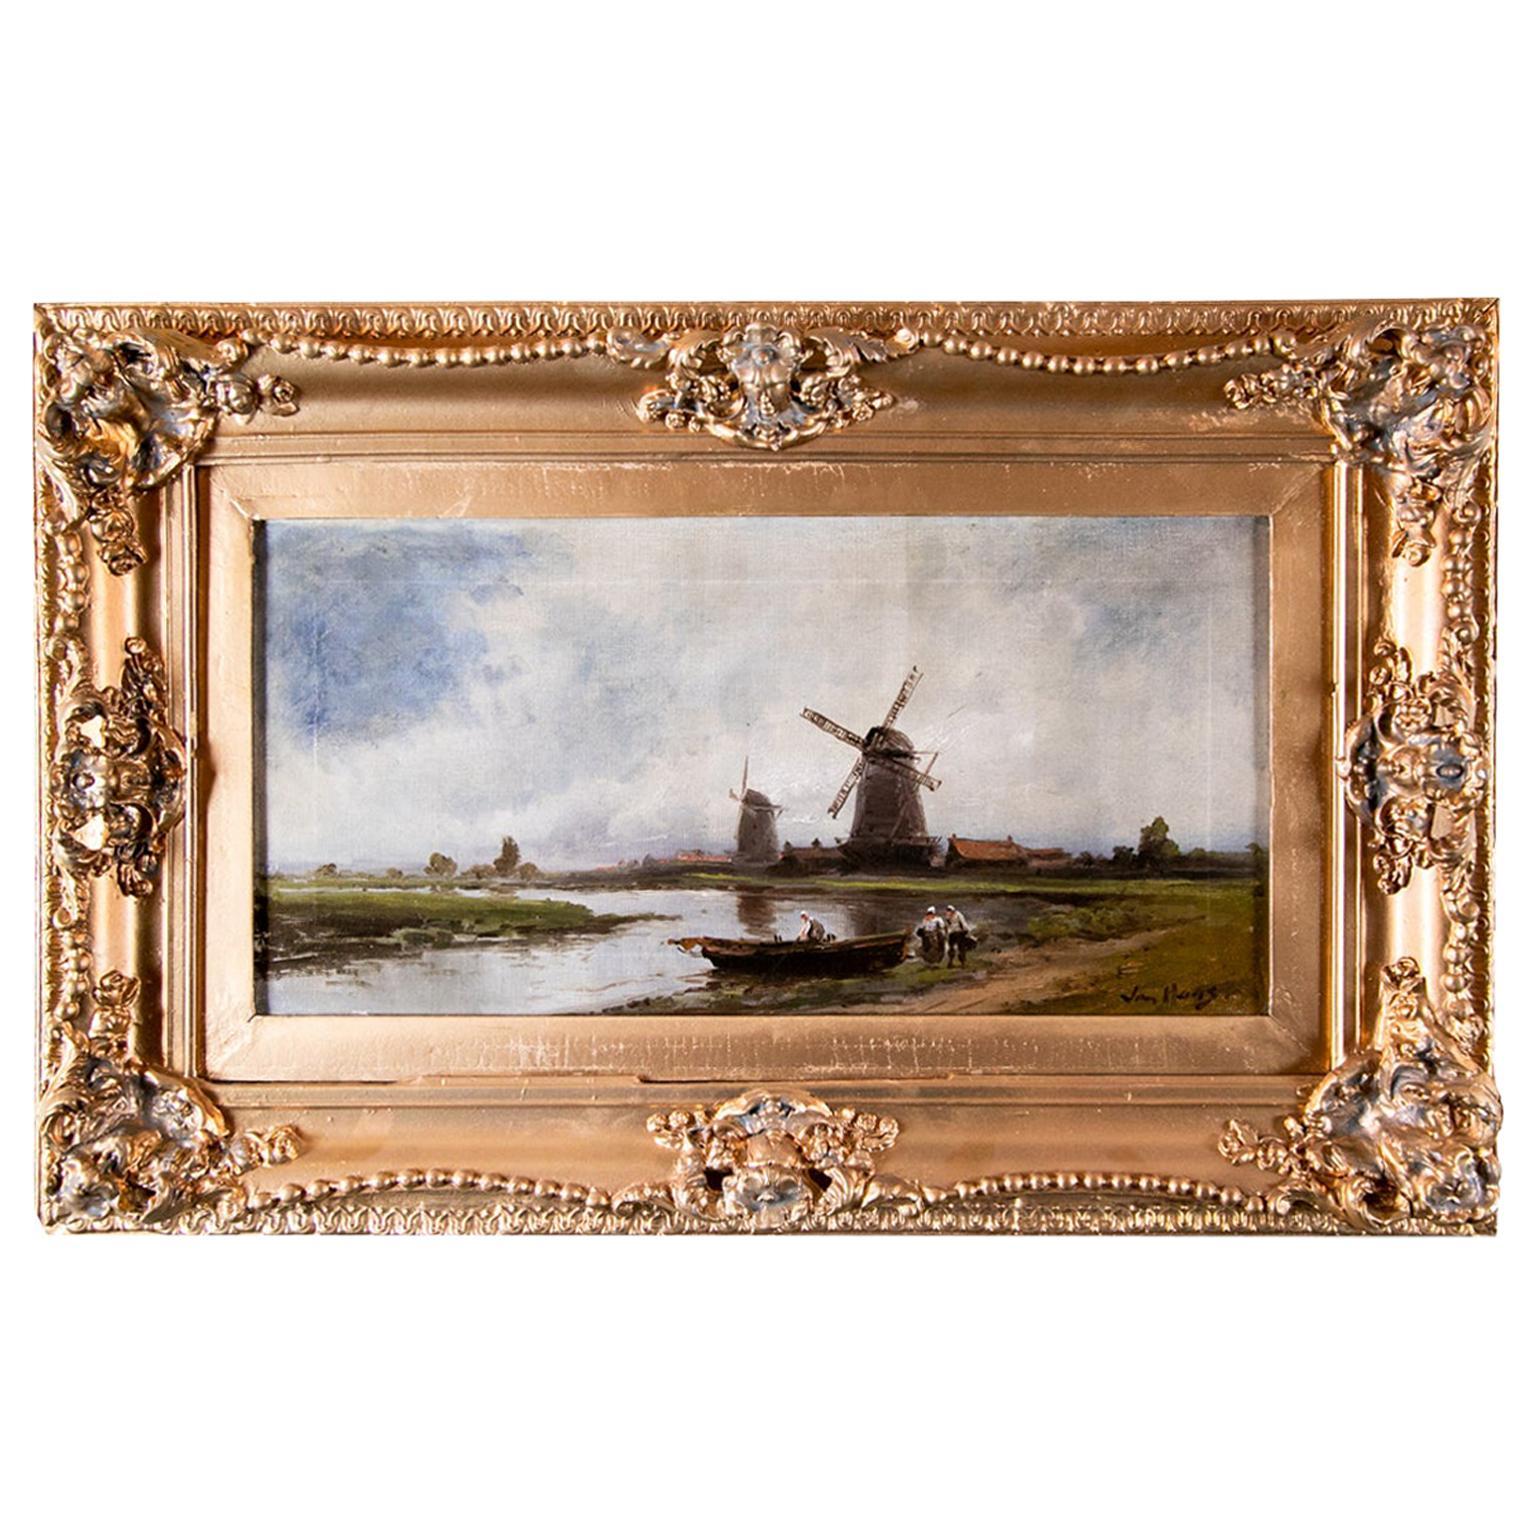 19th Century Dutch Landscape Scene Oil Painting